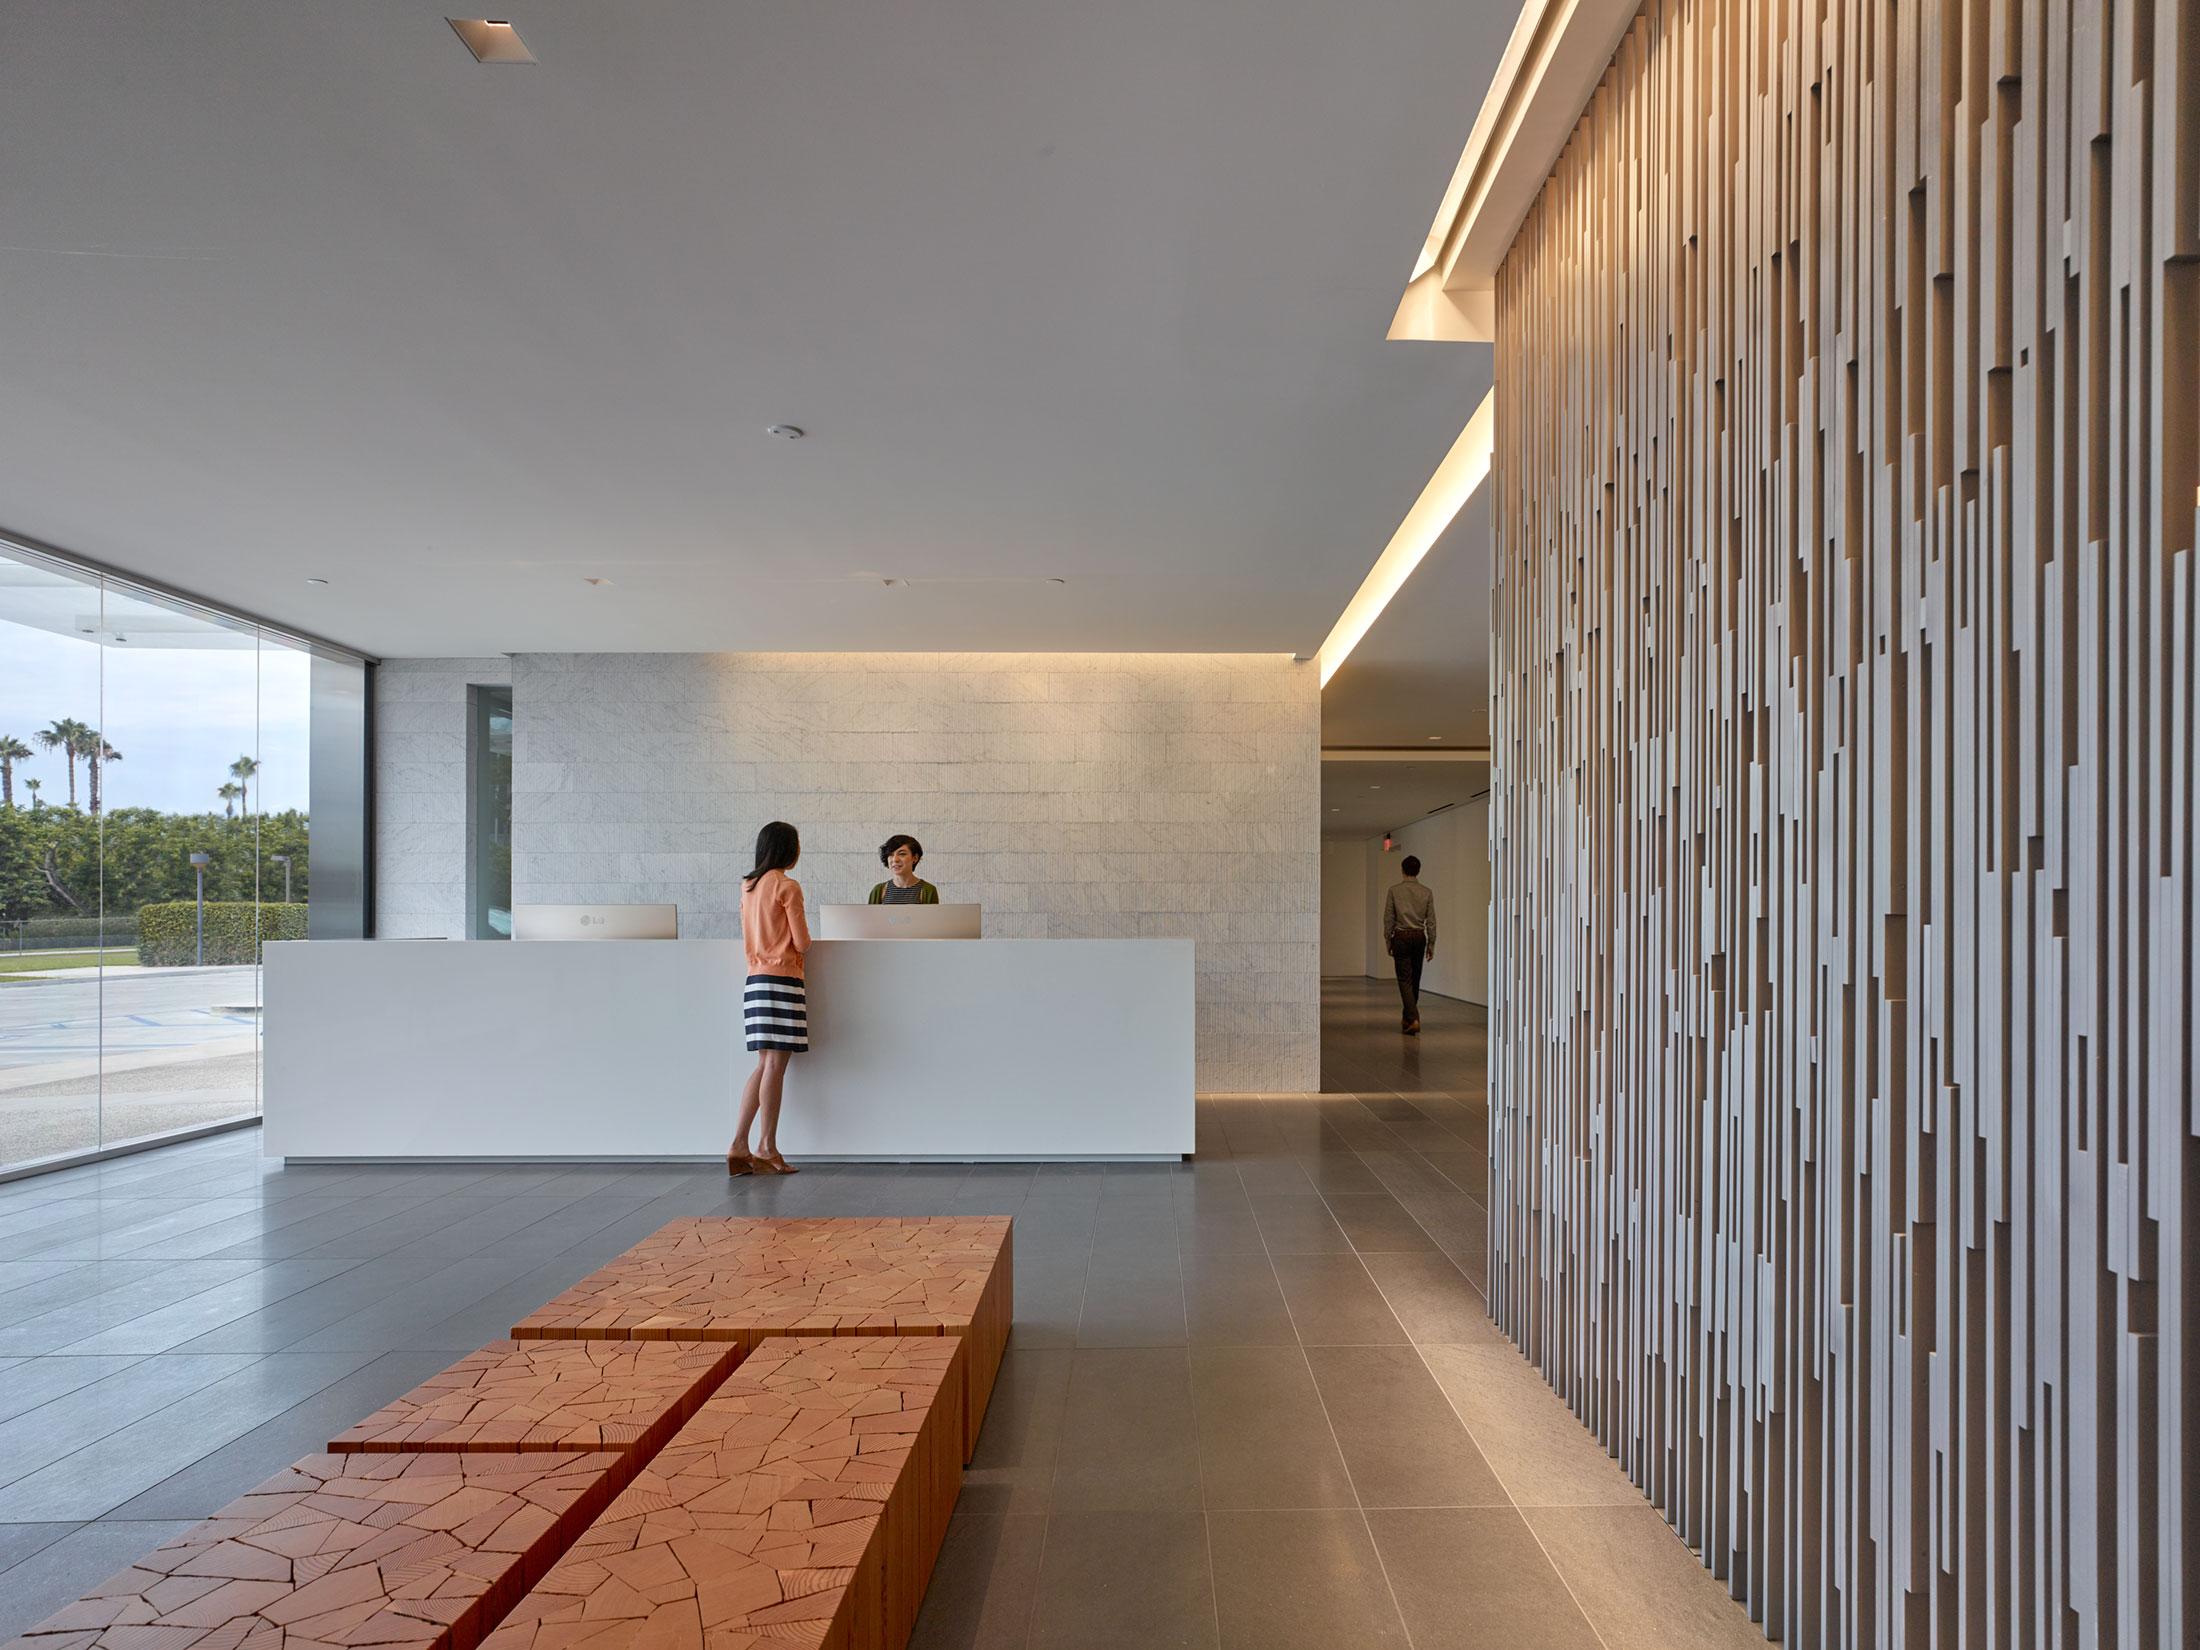 modern-architecture-commercial-interiors-workplace-office-reception-california-shubindonaldson-cim-headquarters-02